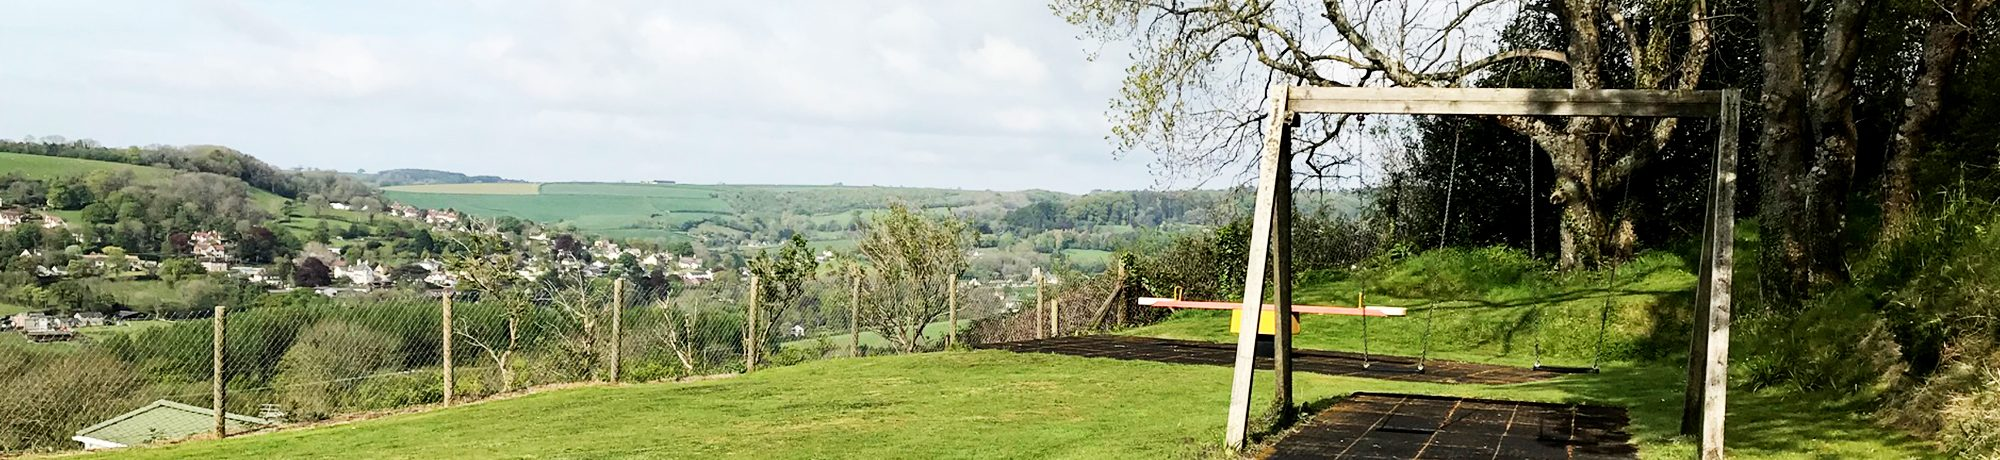 Timber Vale, Slider Image, Lyme Regis, Caravan Park, Campsite, Dorset, Jurassic Coast, Dorset Campsite 12